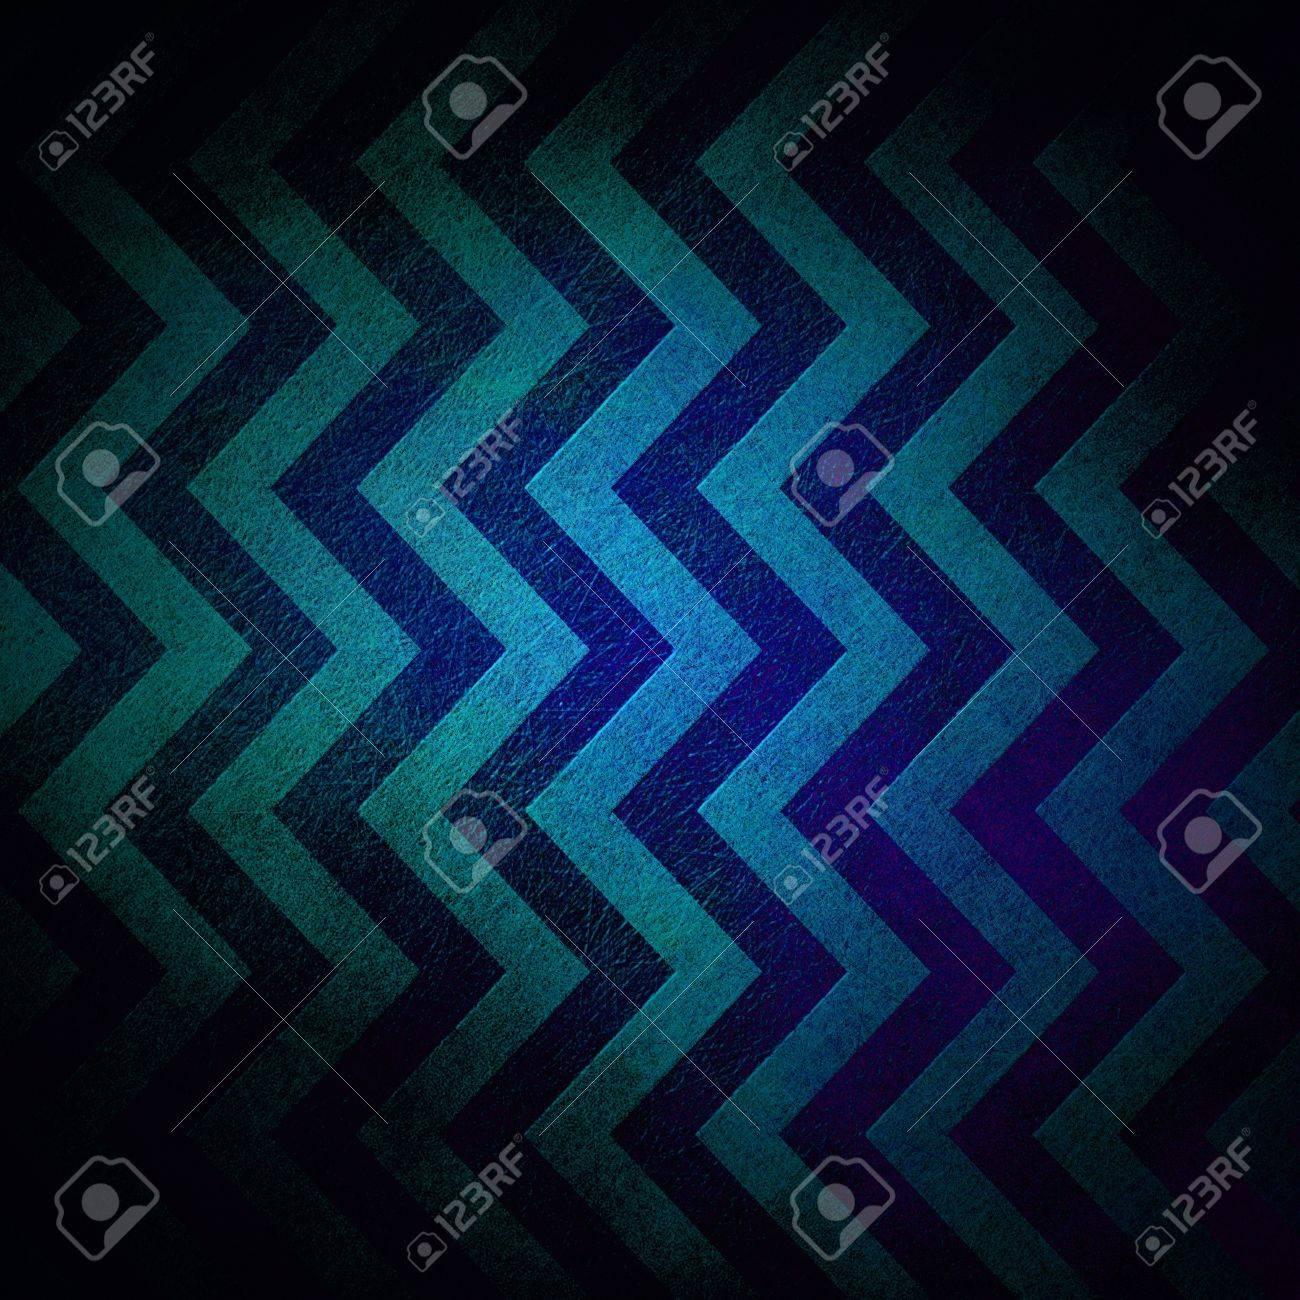 abstract chevron background zigzag pattern stripe lines in dark blue background on vintage grunge background texture canvas, old worn antique abstract background black border for web design banner Stock Photo - 17116245